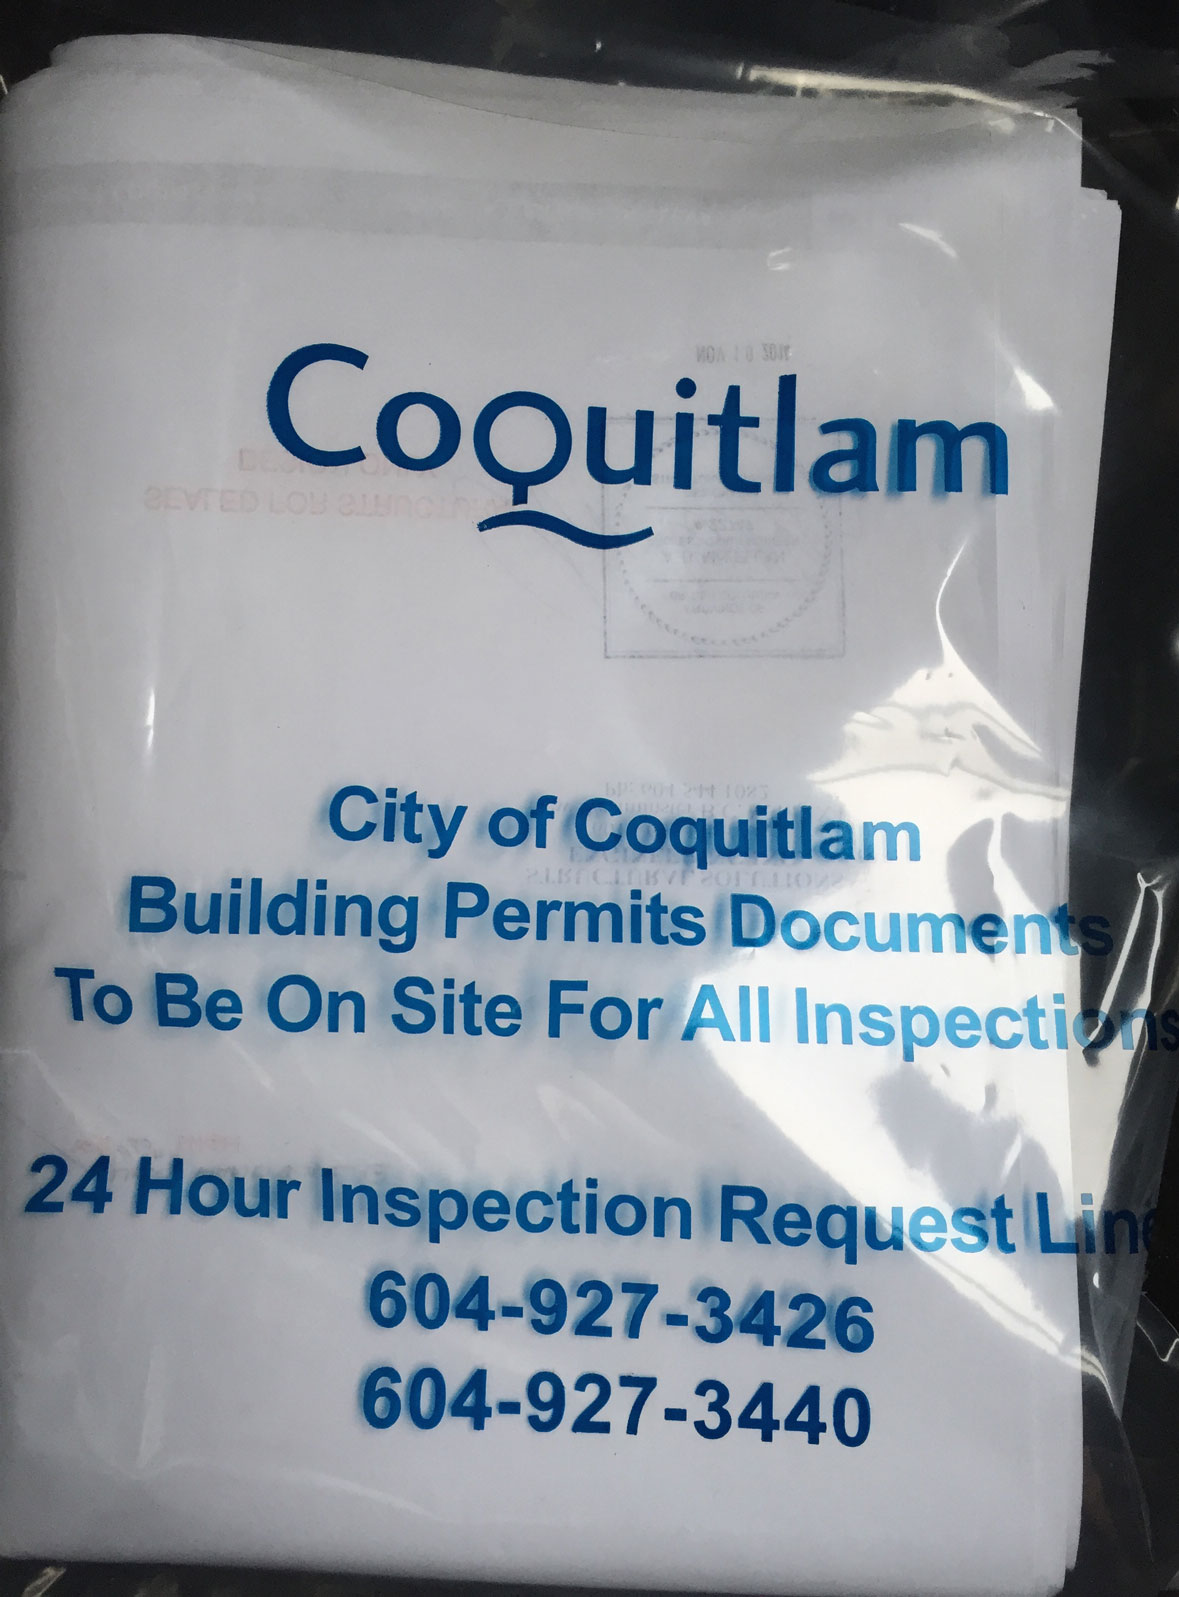 Building Permit in Hand!